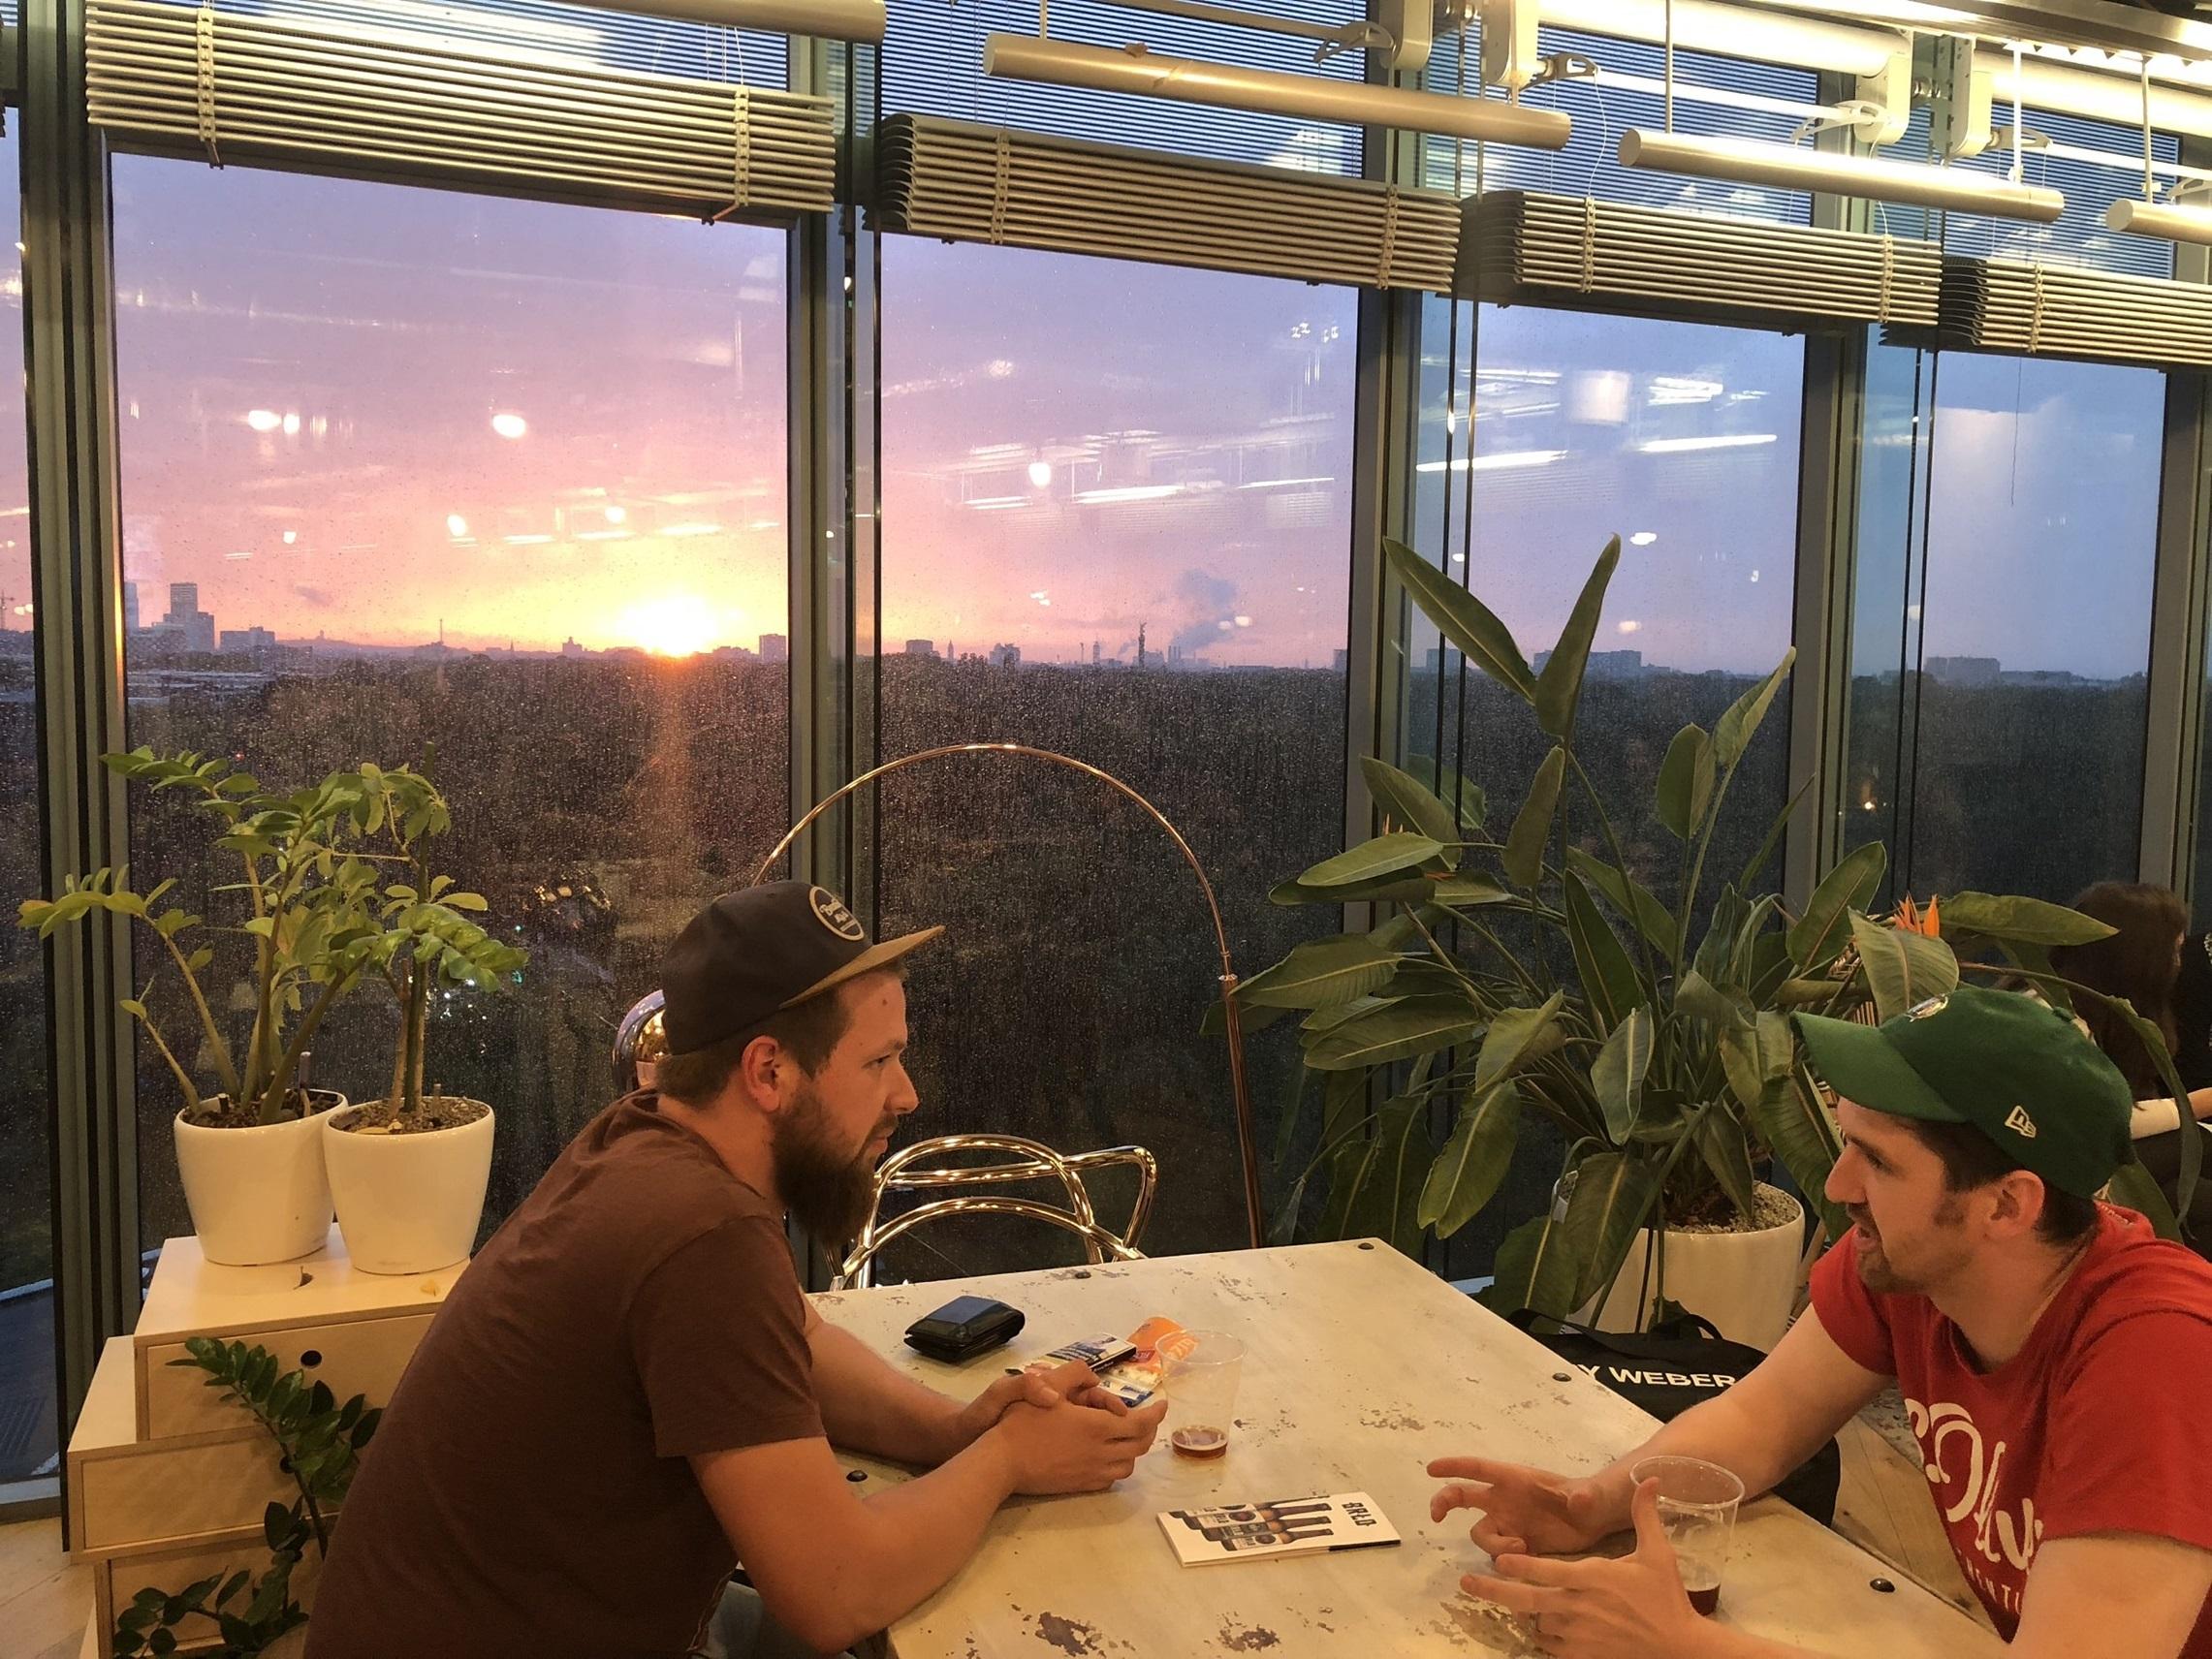 Coworking Space in Berlin: Sony Center